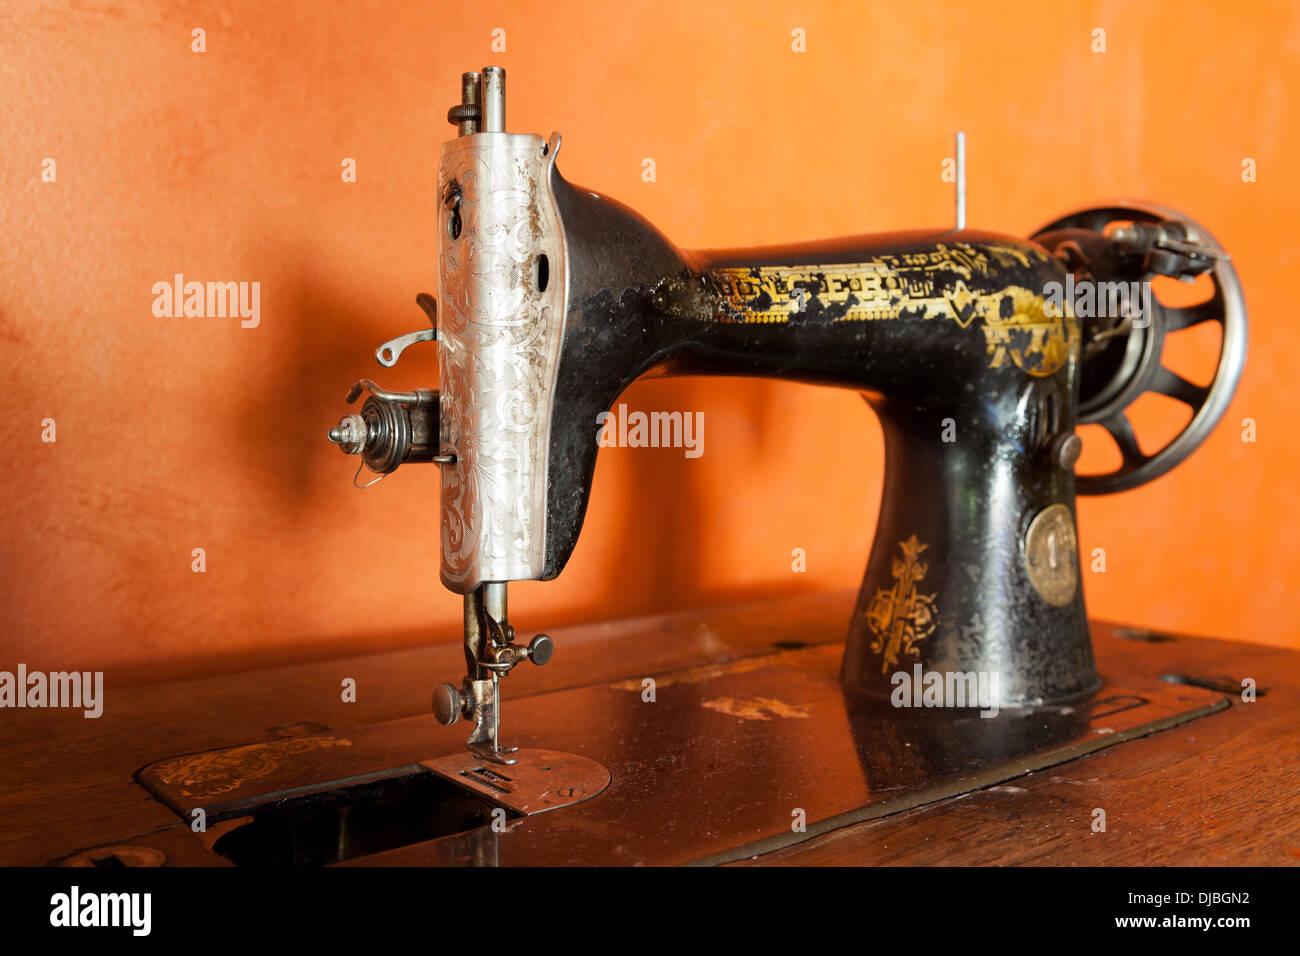 Manual Sewing Machine Stock Photos Manual Sewing Machine Stock